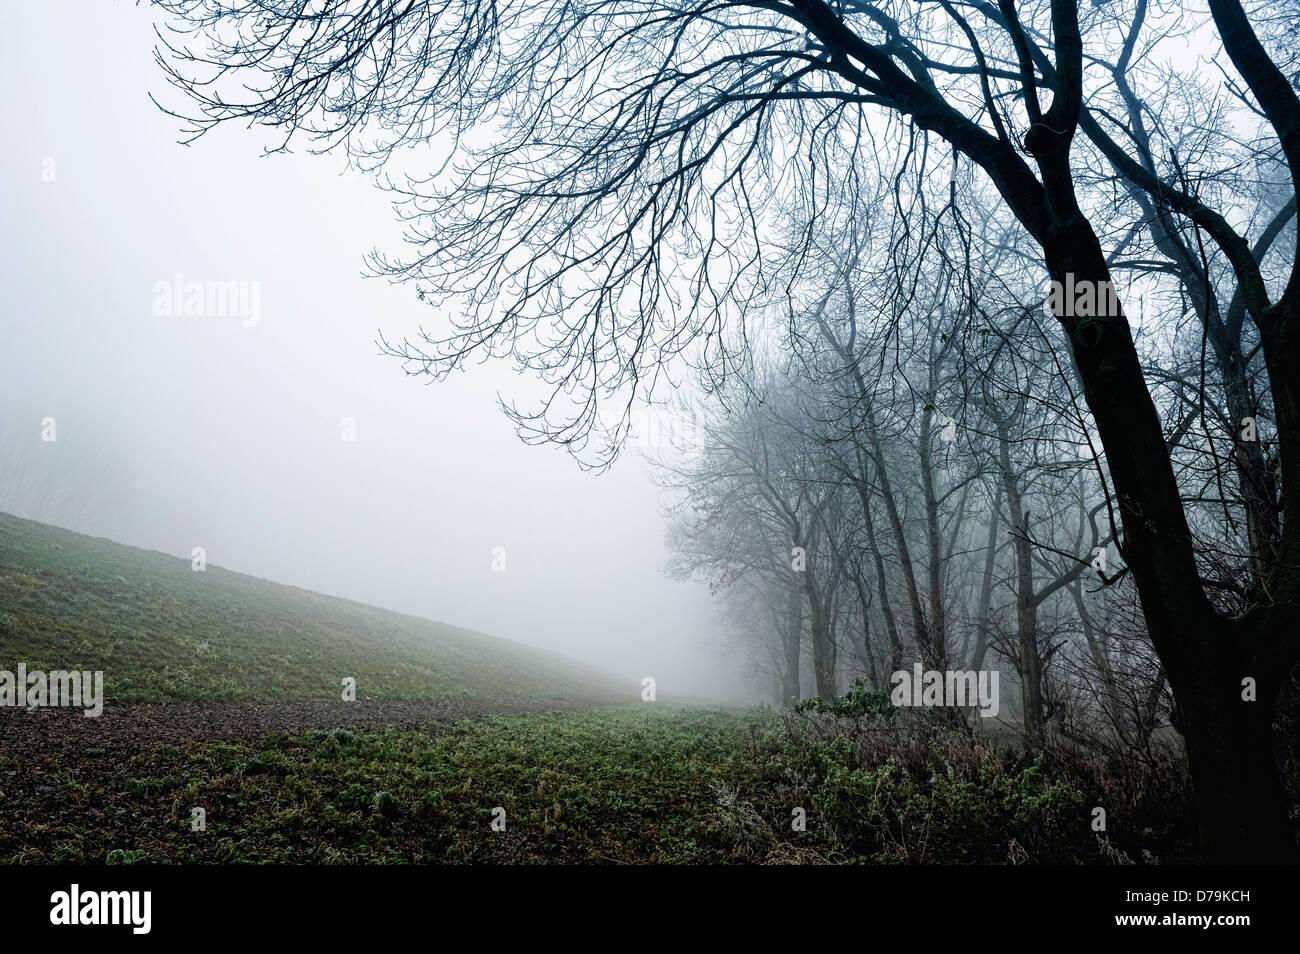 Fog in the Elbufer in Kirchwerder, 4 and marshy land, Hamburg, Germany, Europe Stock Photo